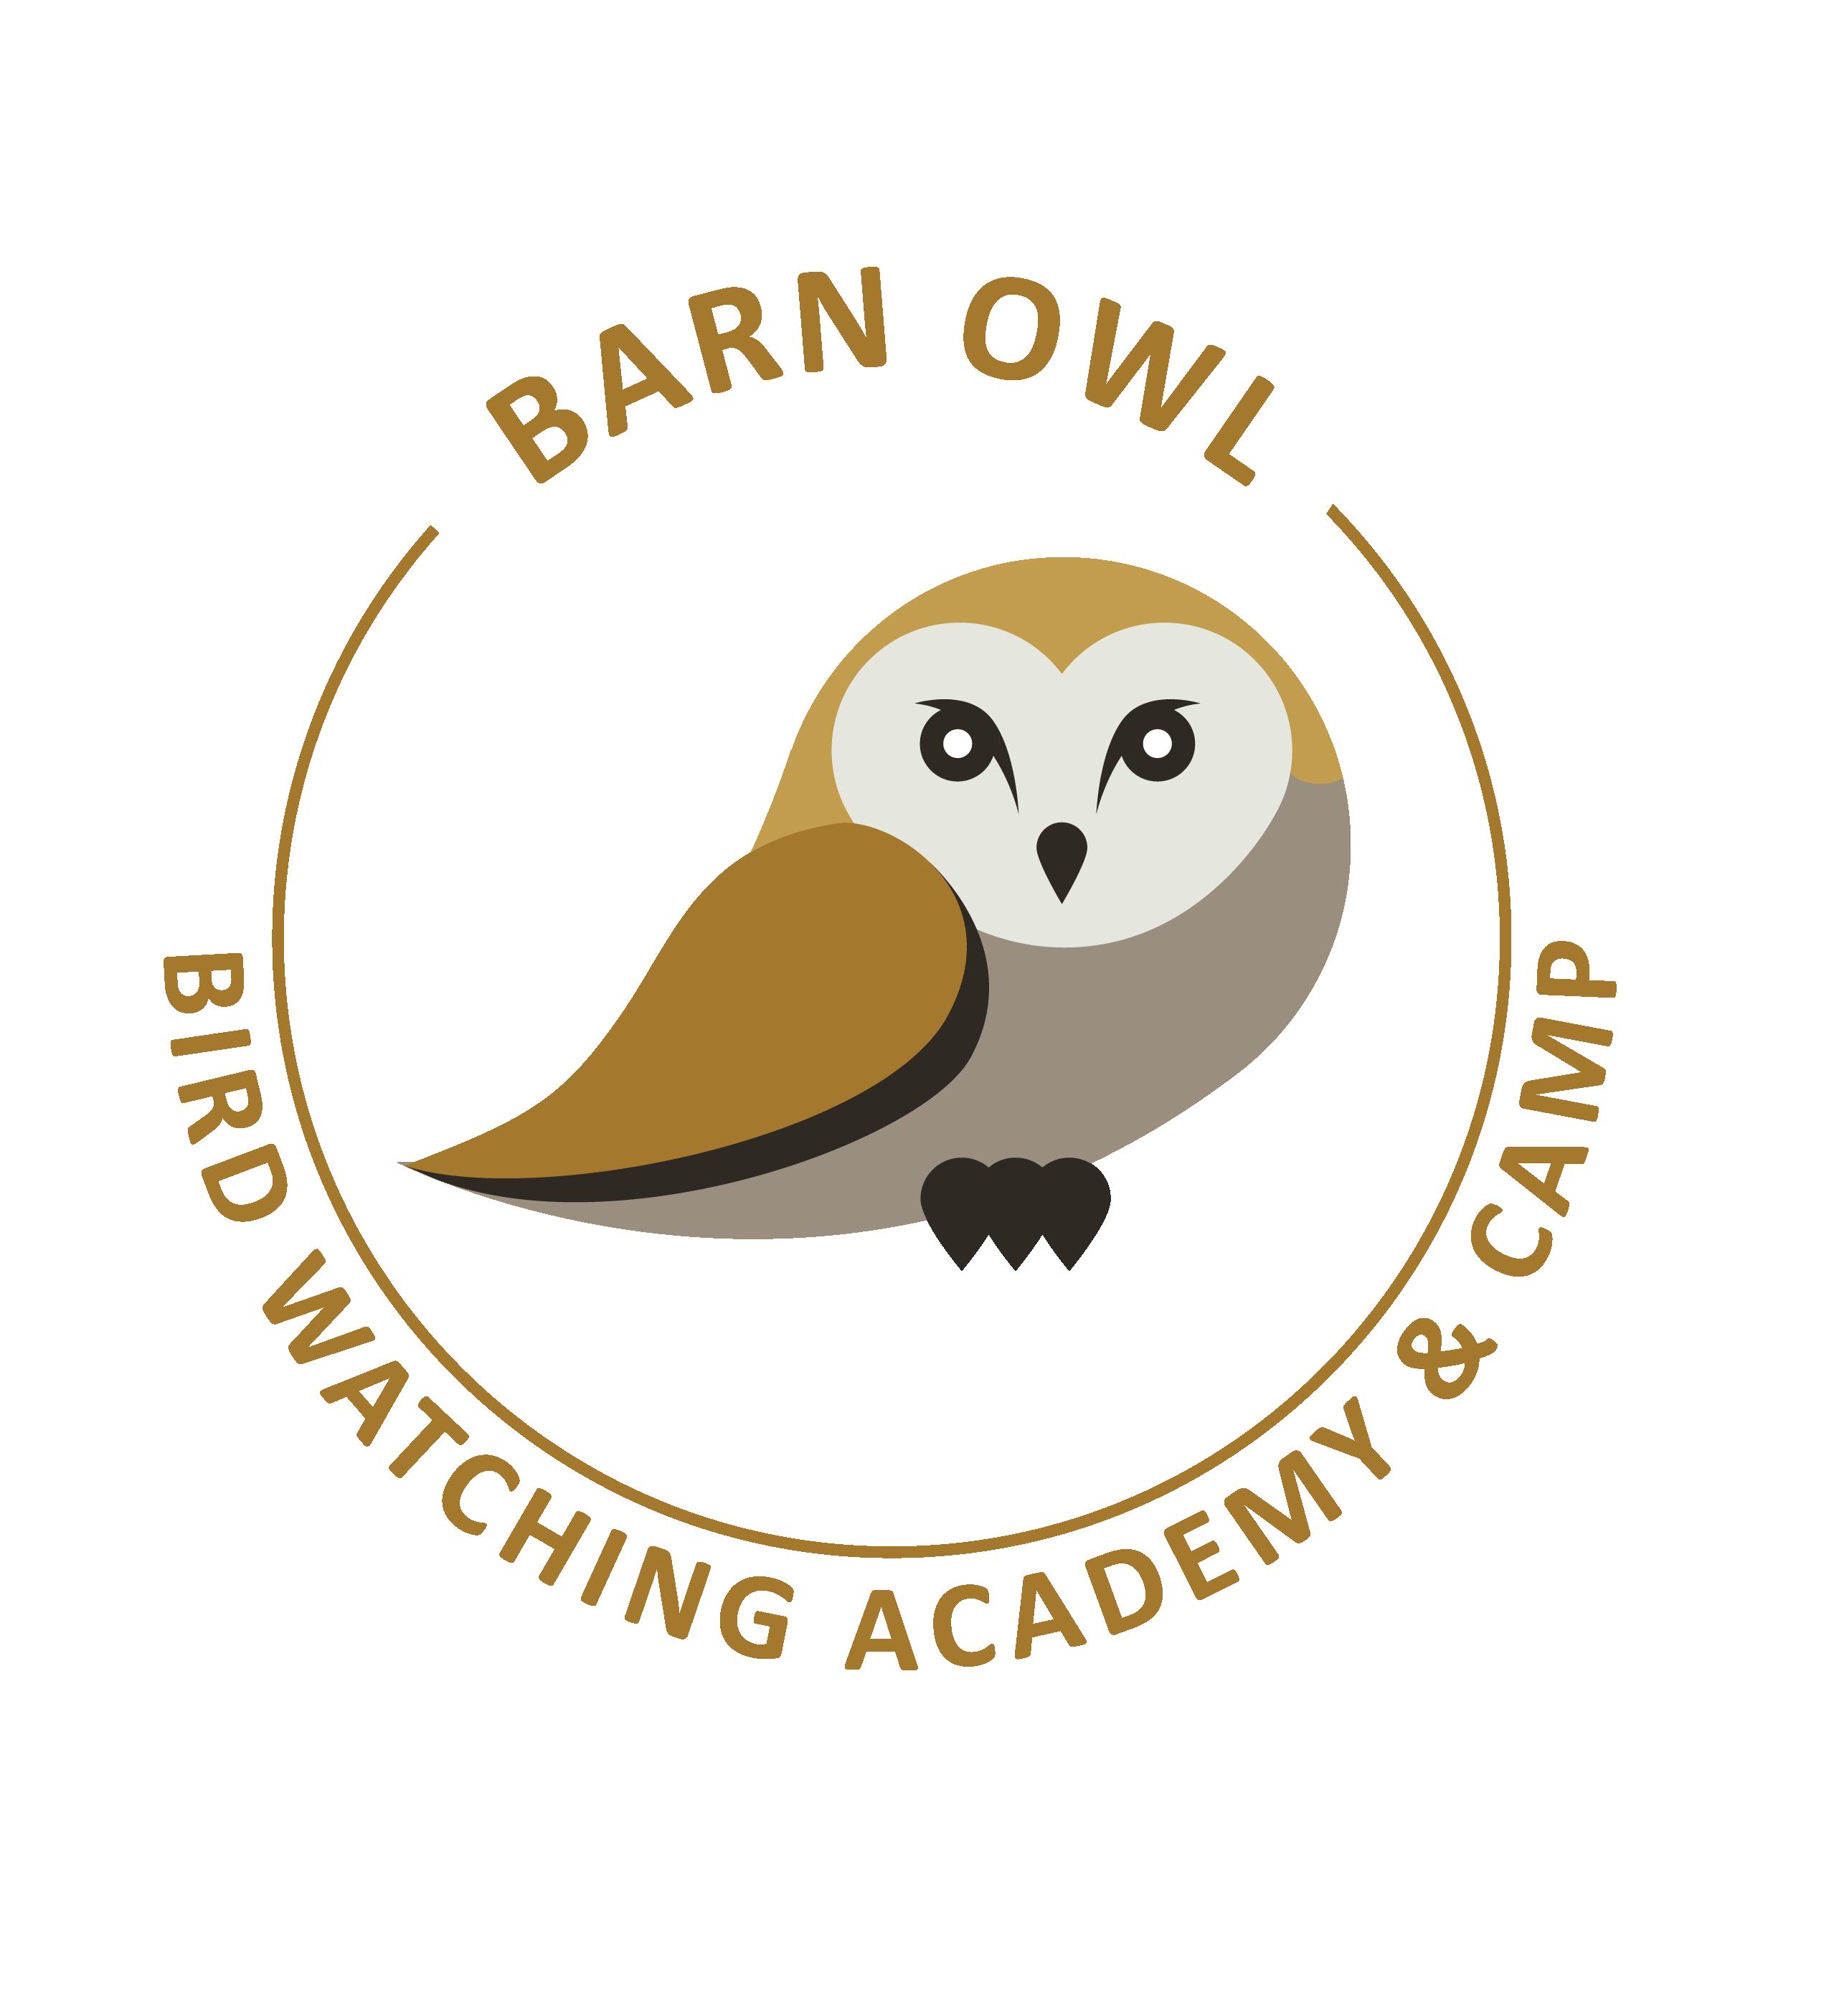 Barn Owl - Bird Watching Academy